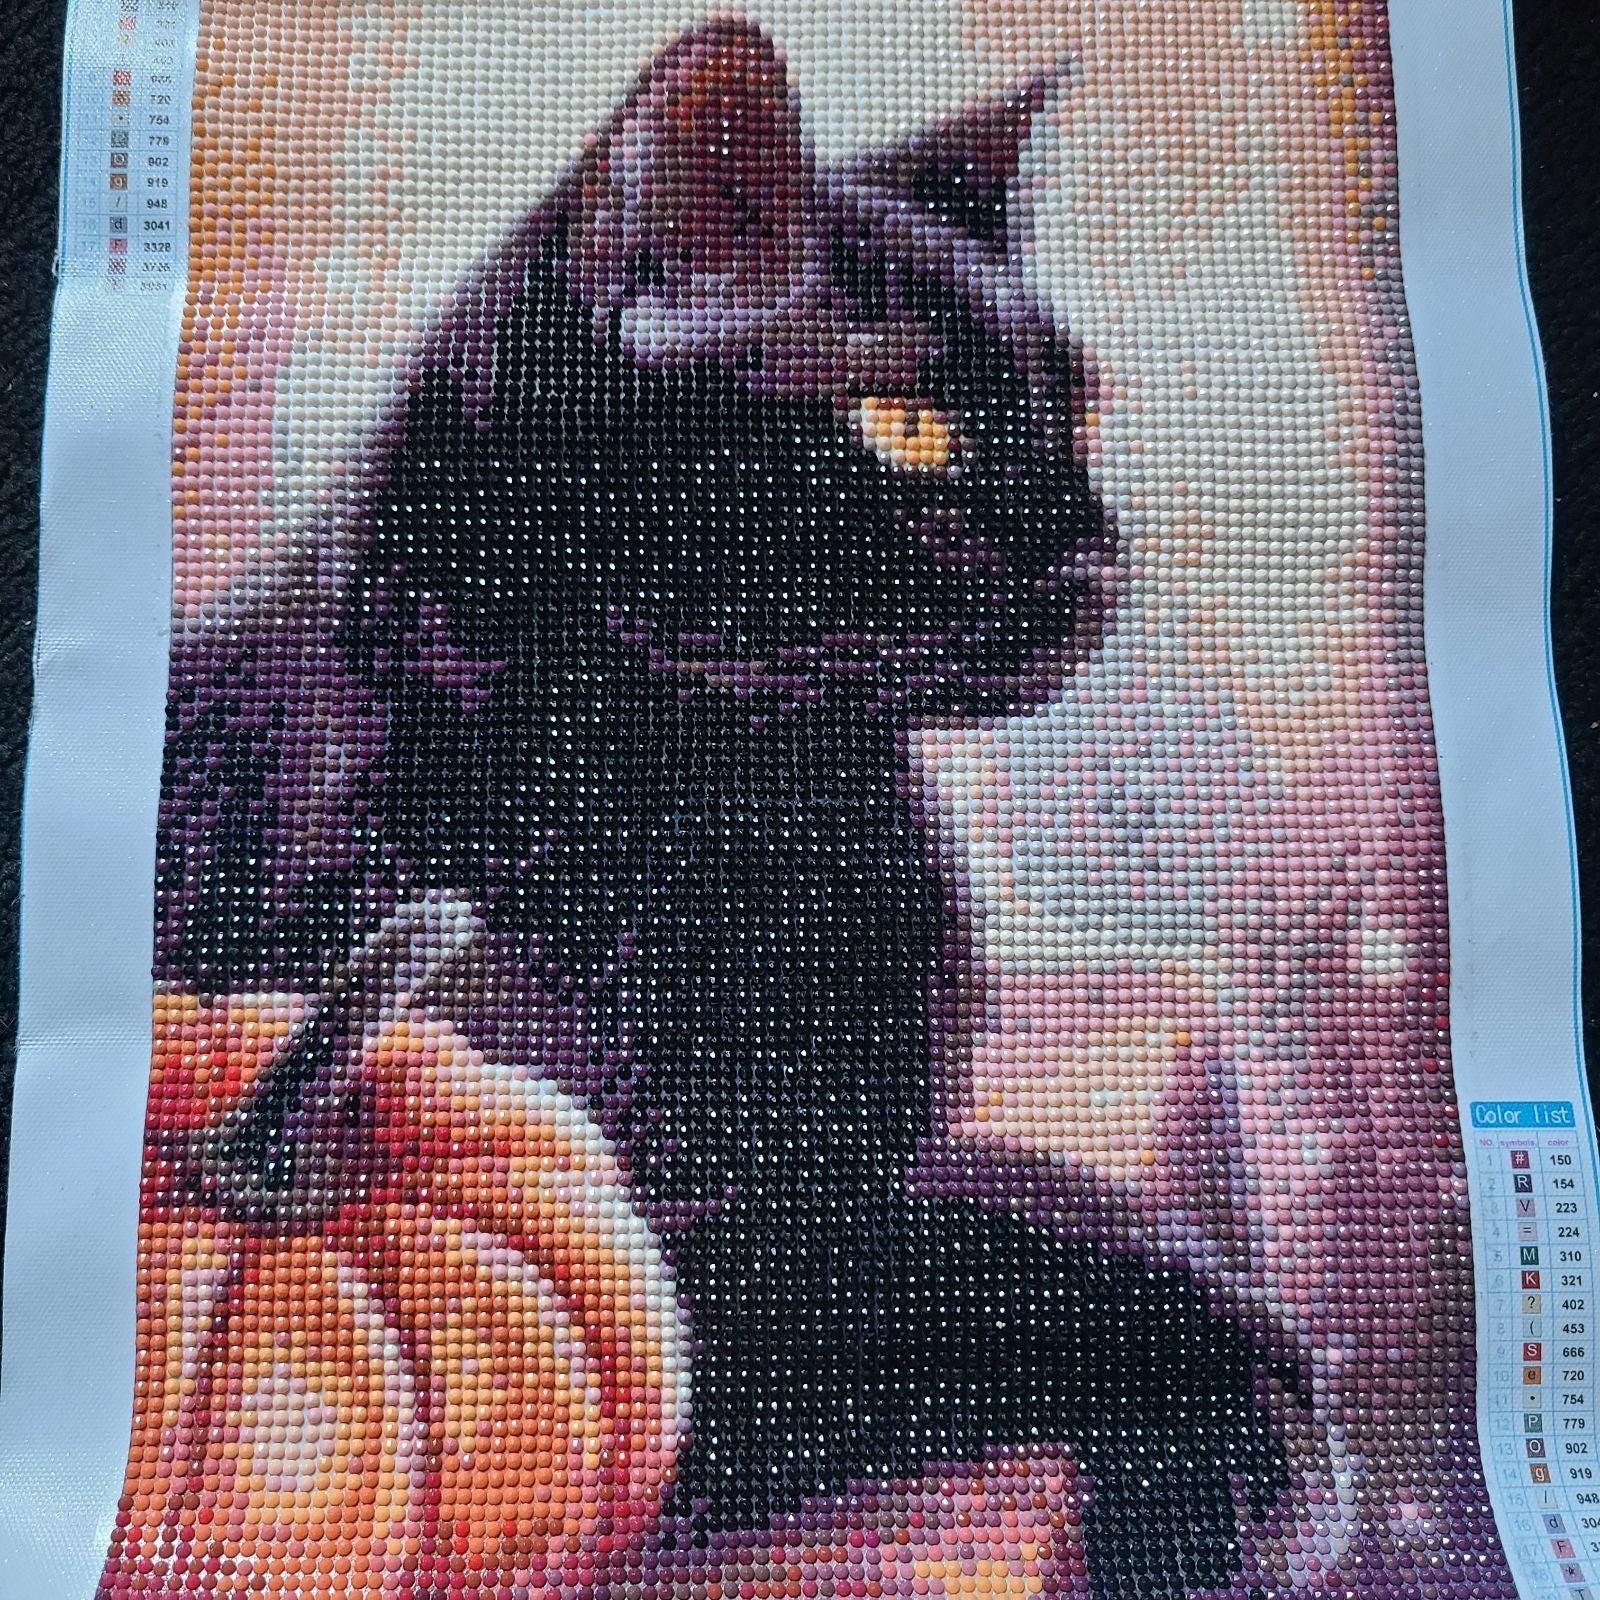 Black Cat diamond art painting